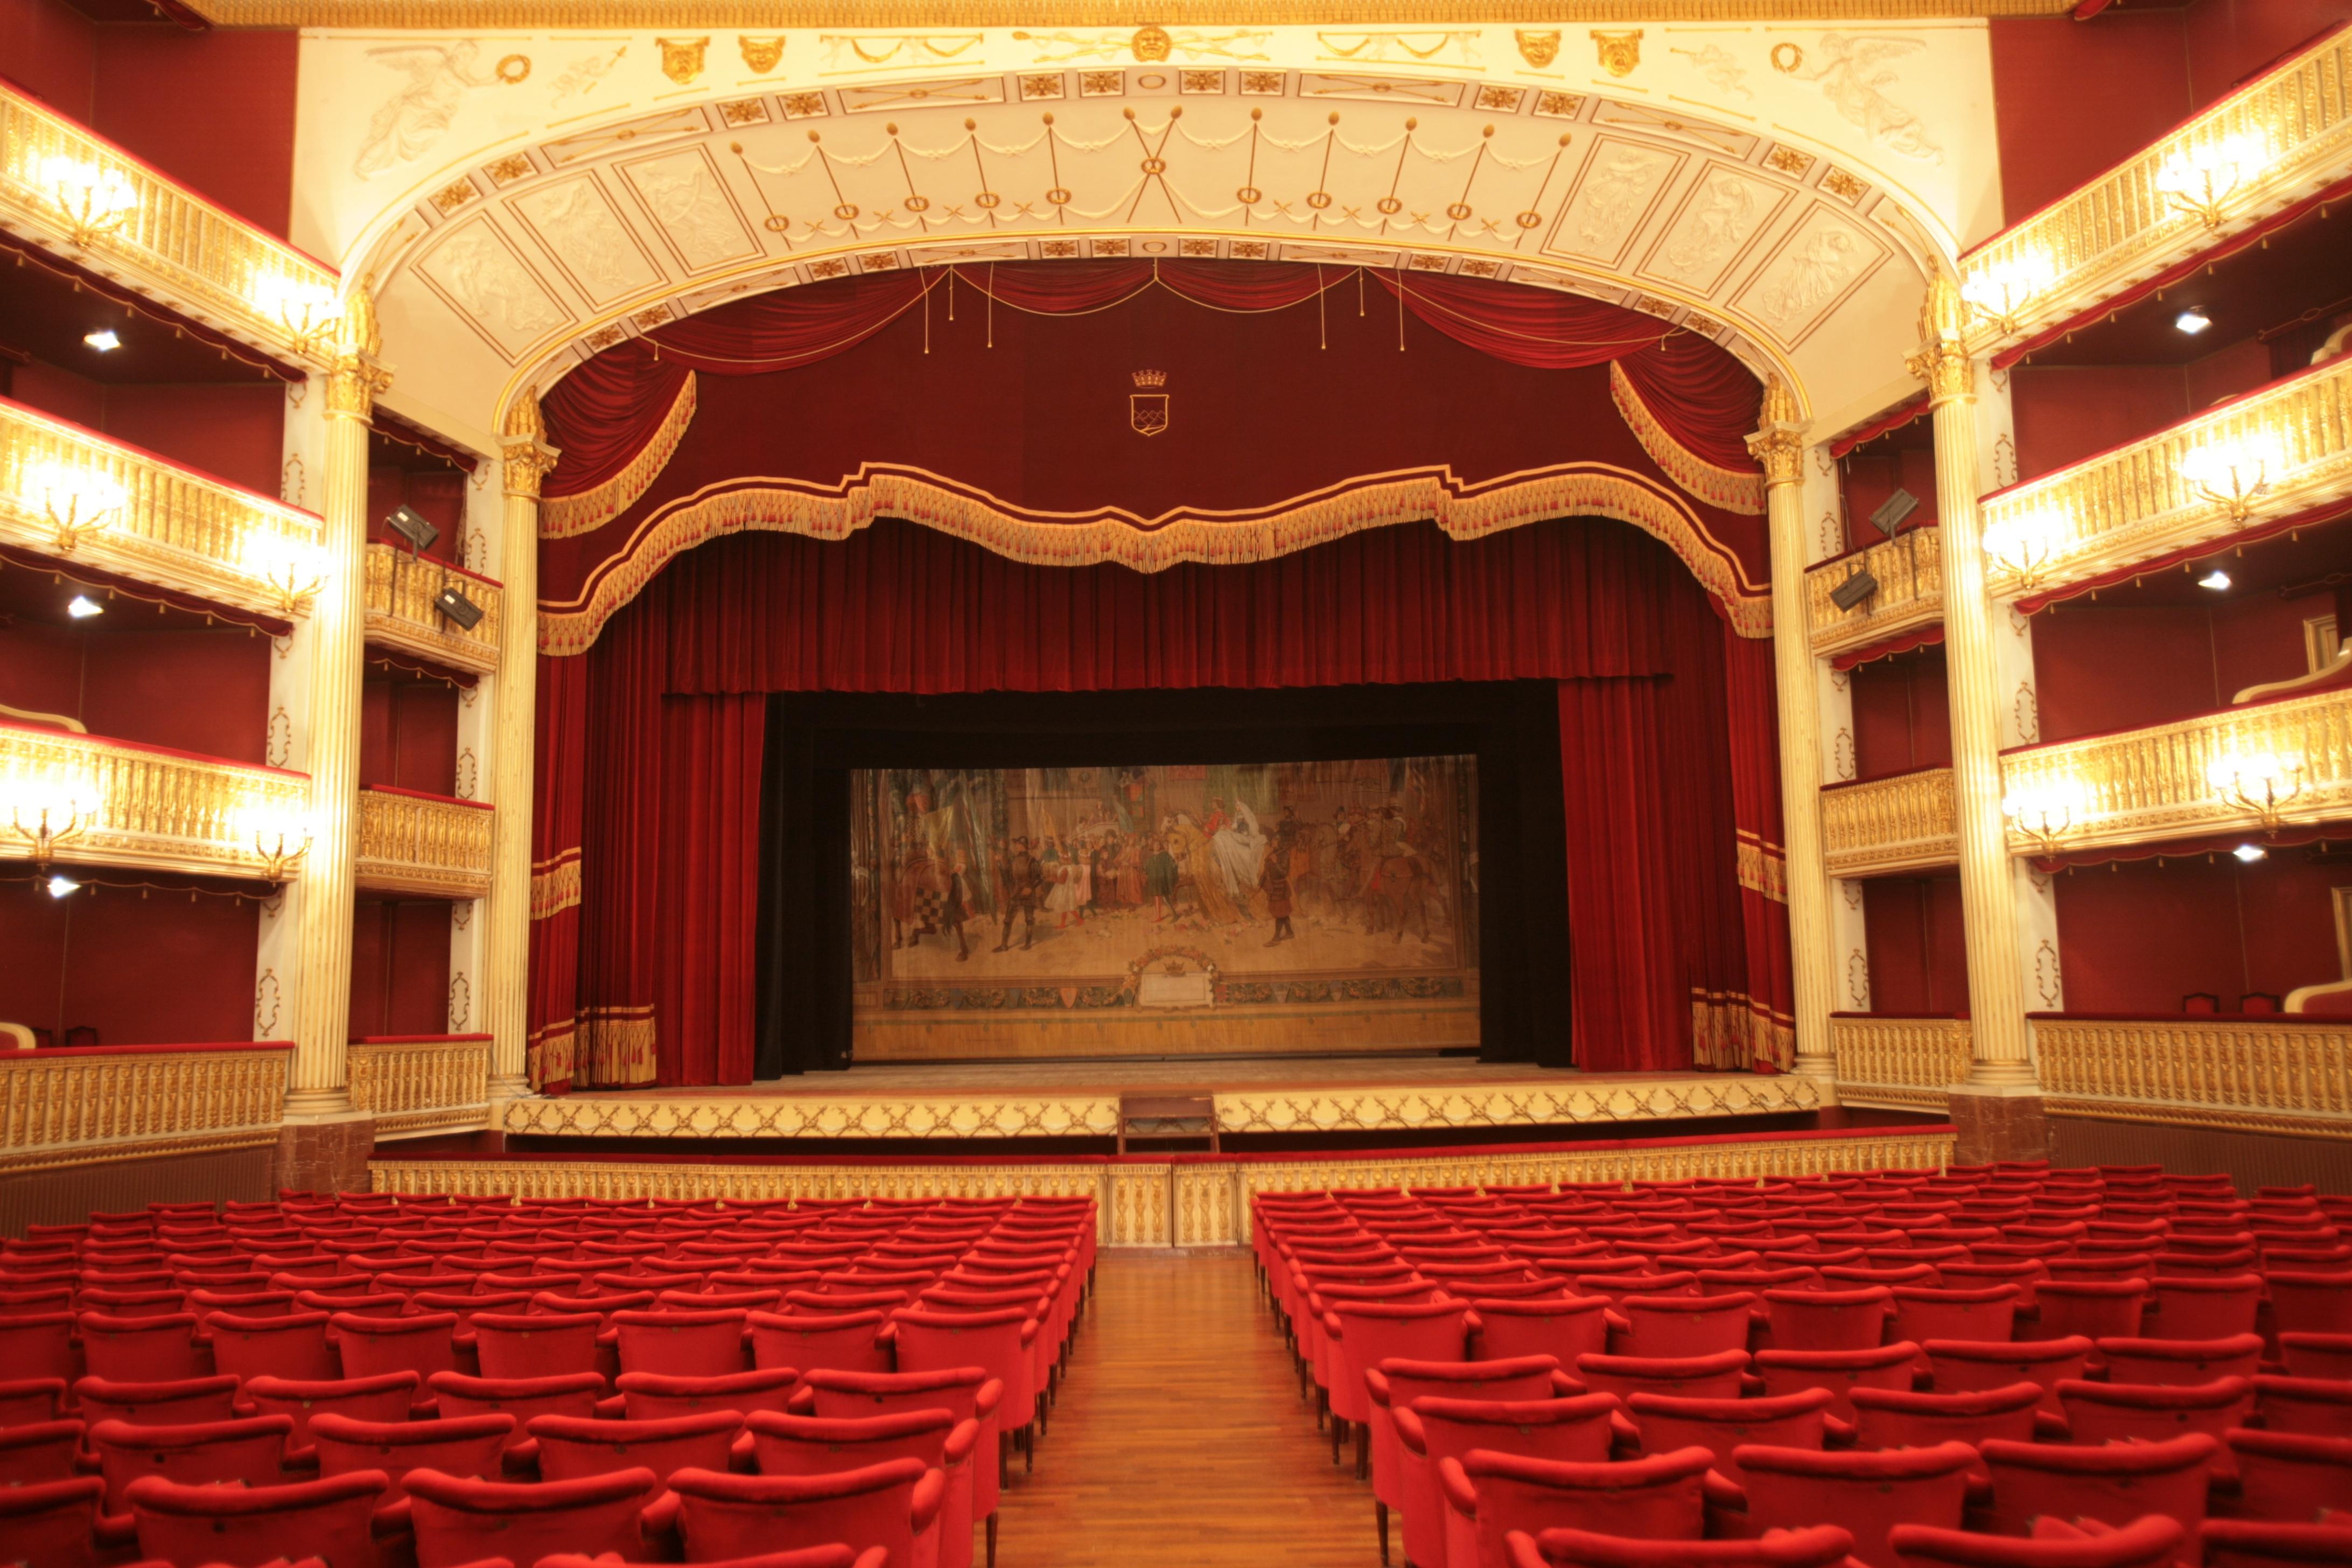 Interno teatro Rendano con sipario storico